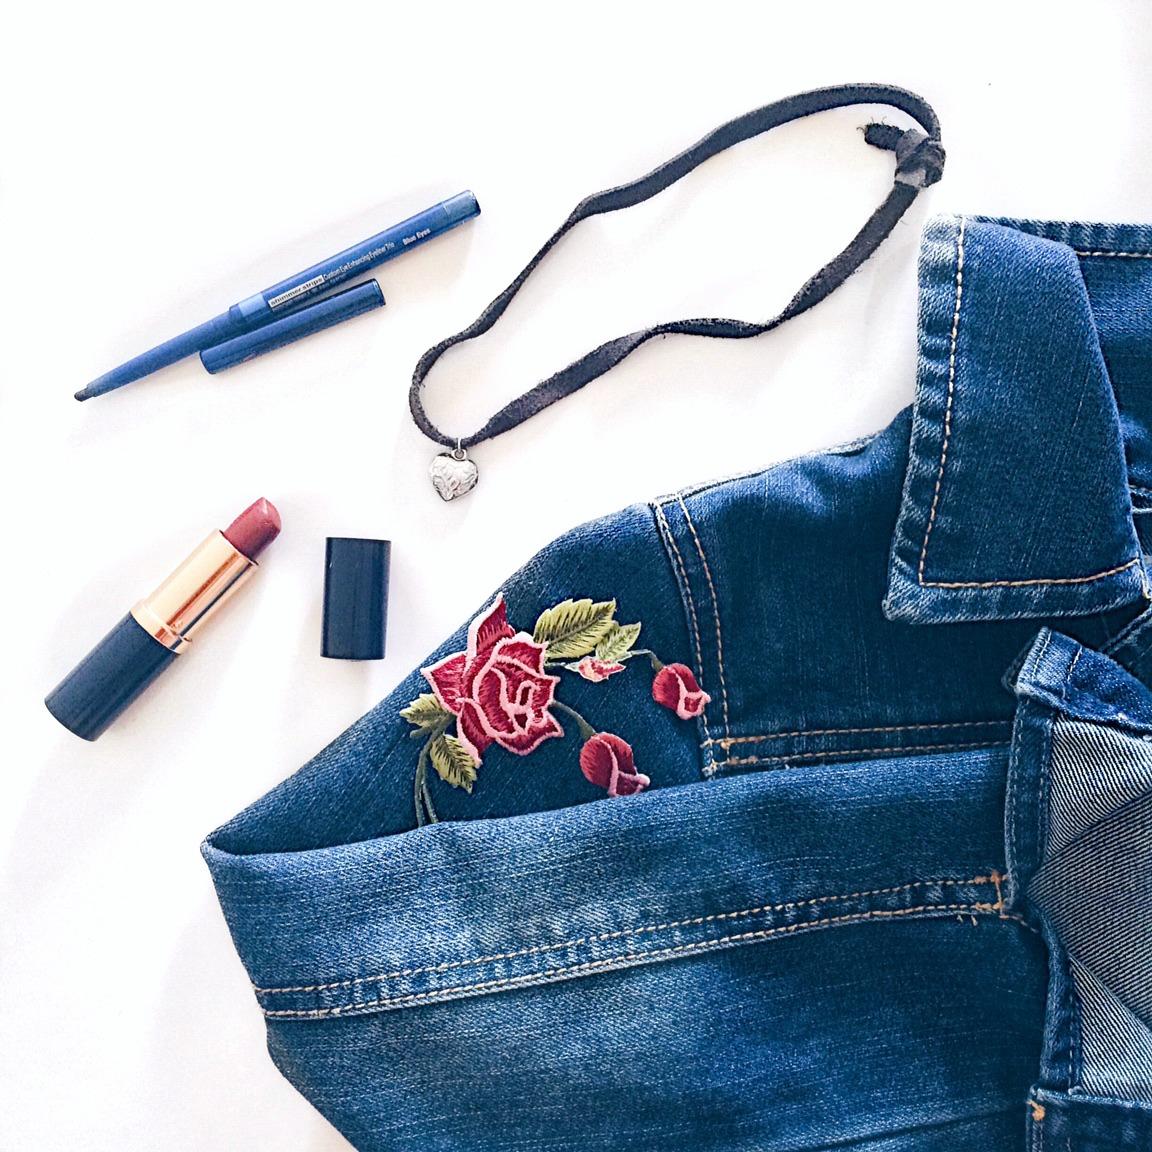 90s trend denim brown liquid lipstick kylie lip kit patches pins choker